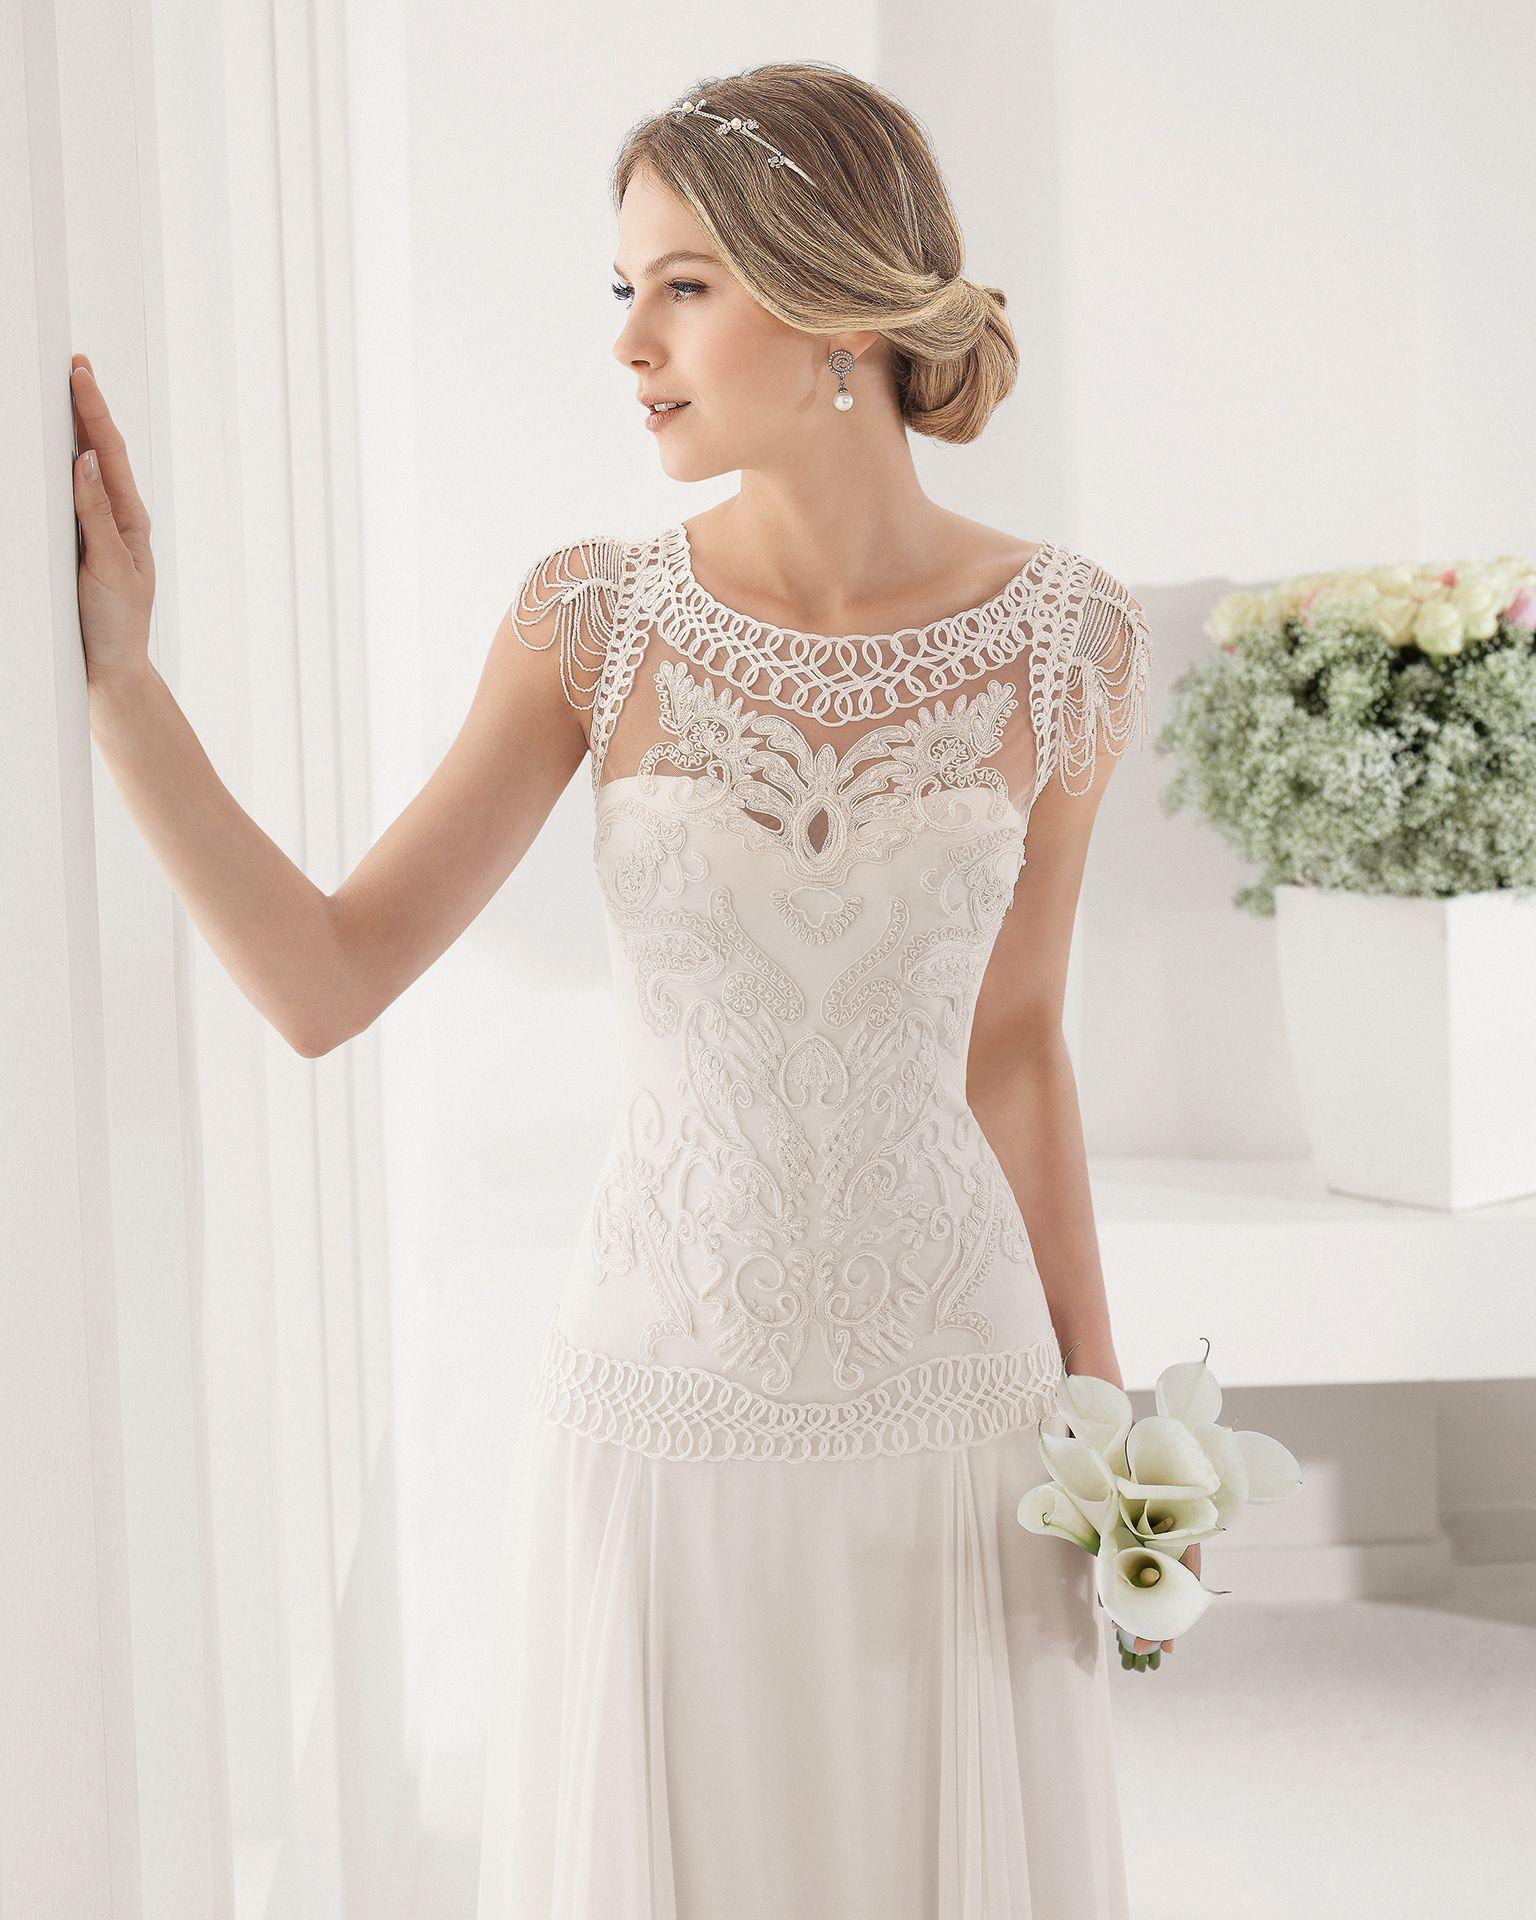 8b116 palmer wedding dresses 2015 collection alma for Alma novia wedding dress